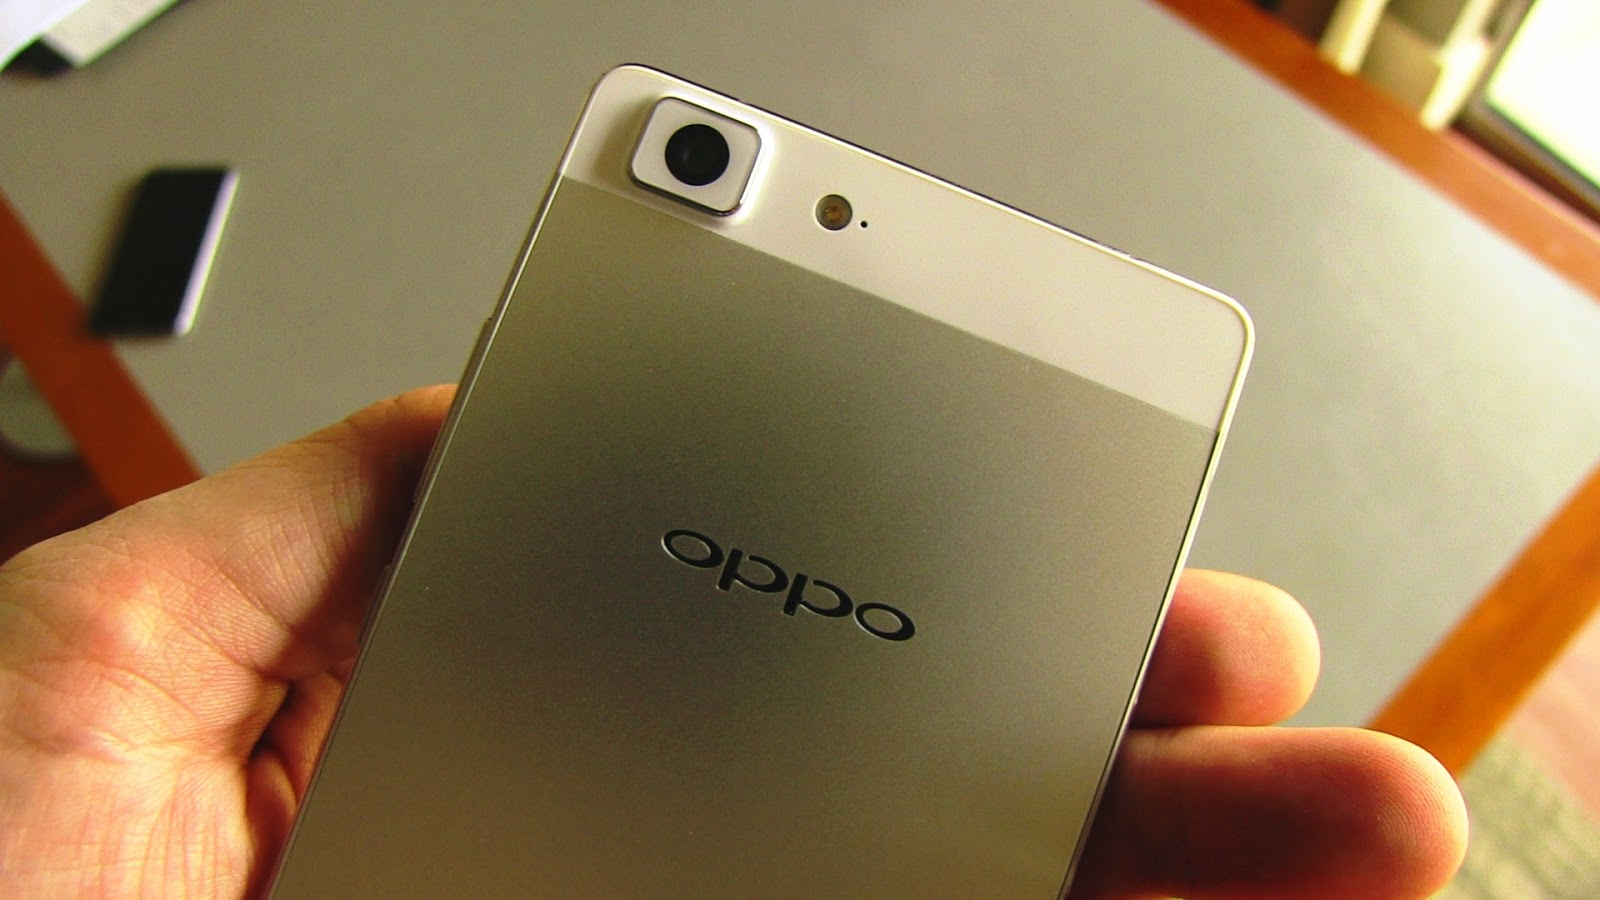 Spesifik dan Harga OPPO R5